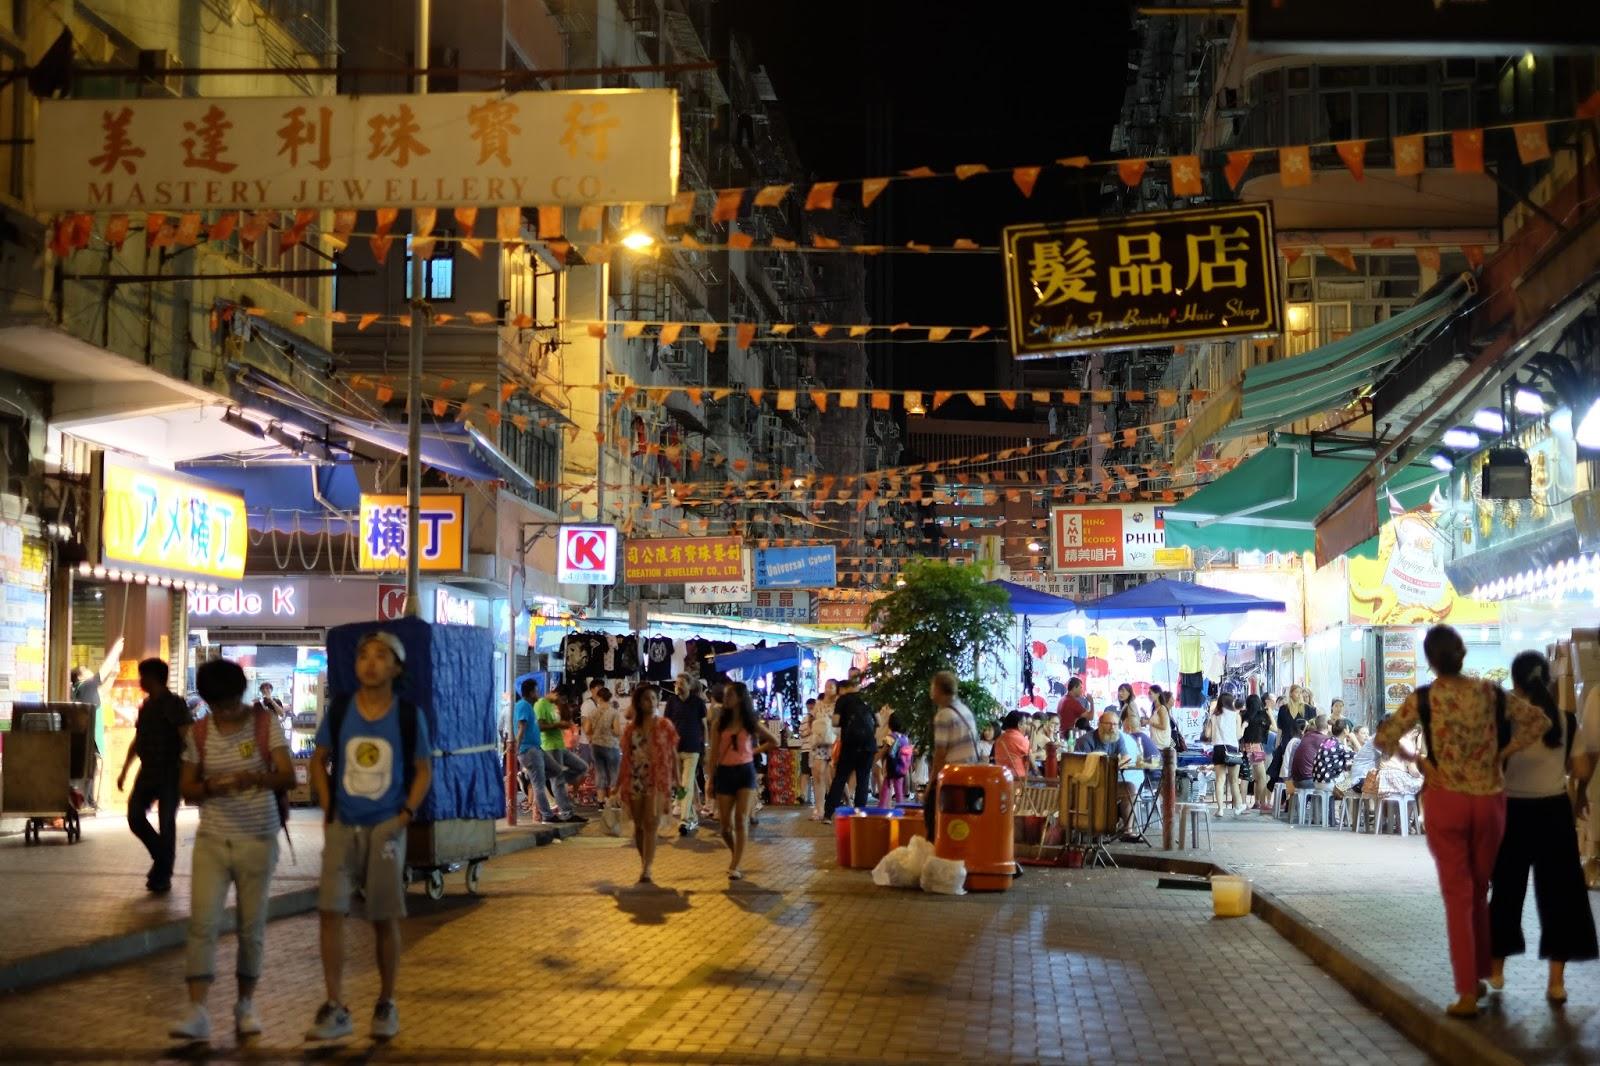 Biaya Liburan 5 Hari di Hong Kong dan Singapura-4 temple street yau ma tei